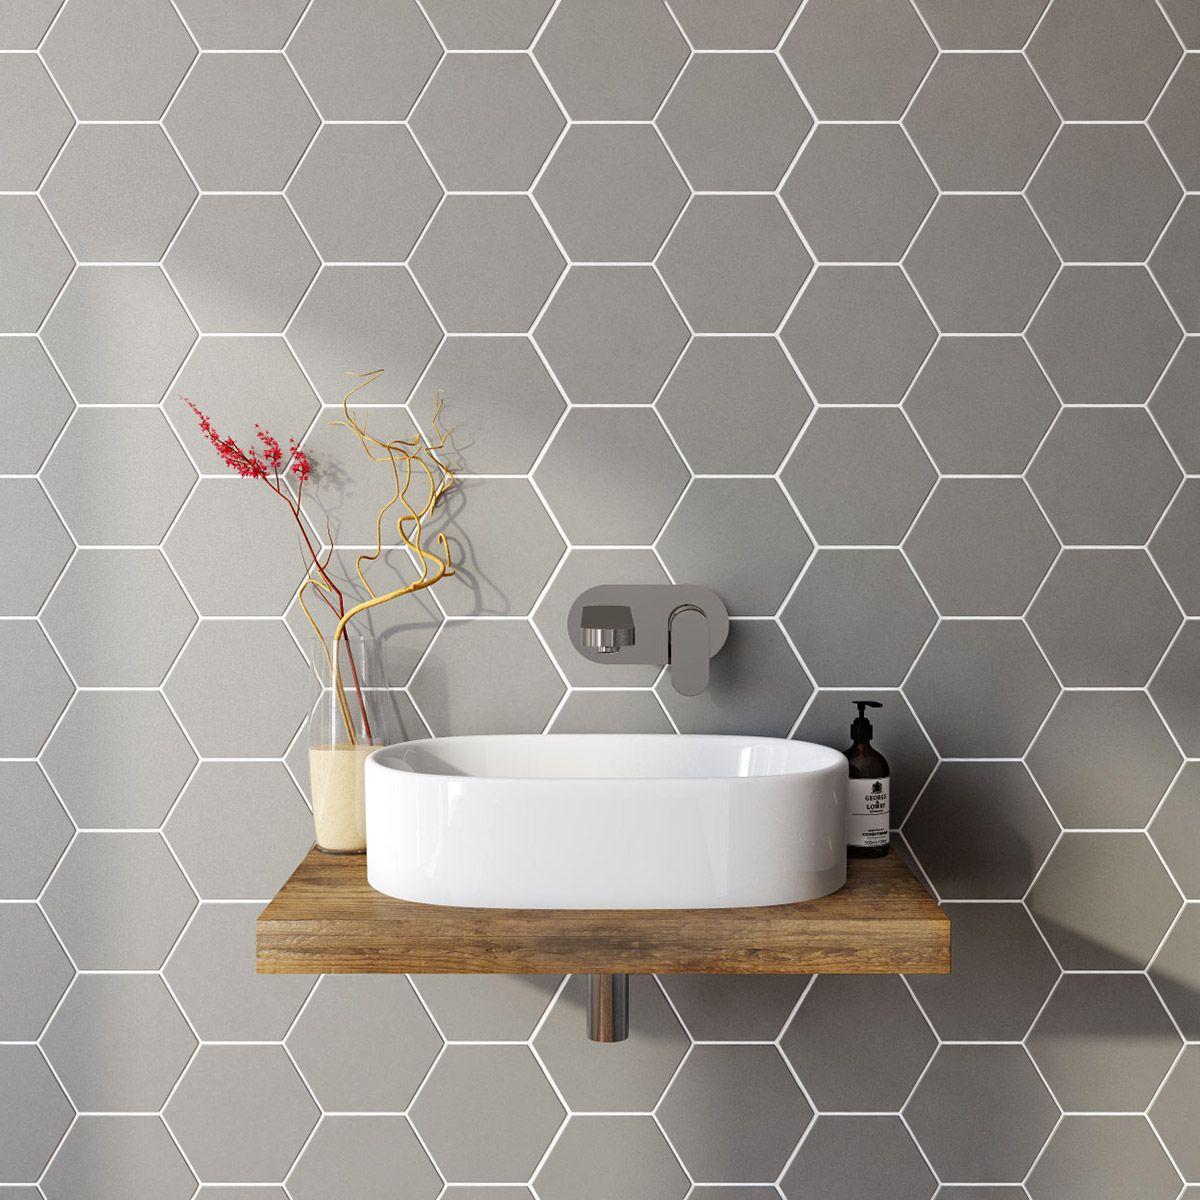 Gray Marble Hex Floor Tile Design Ideas black hex tile bathroom floor